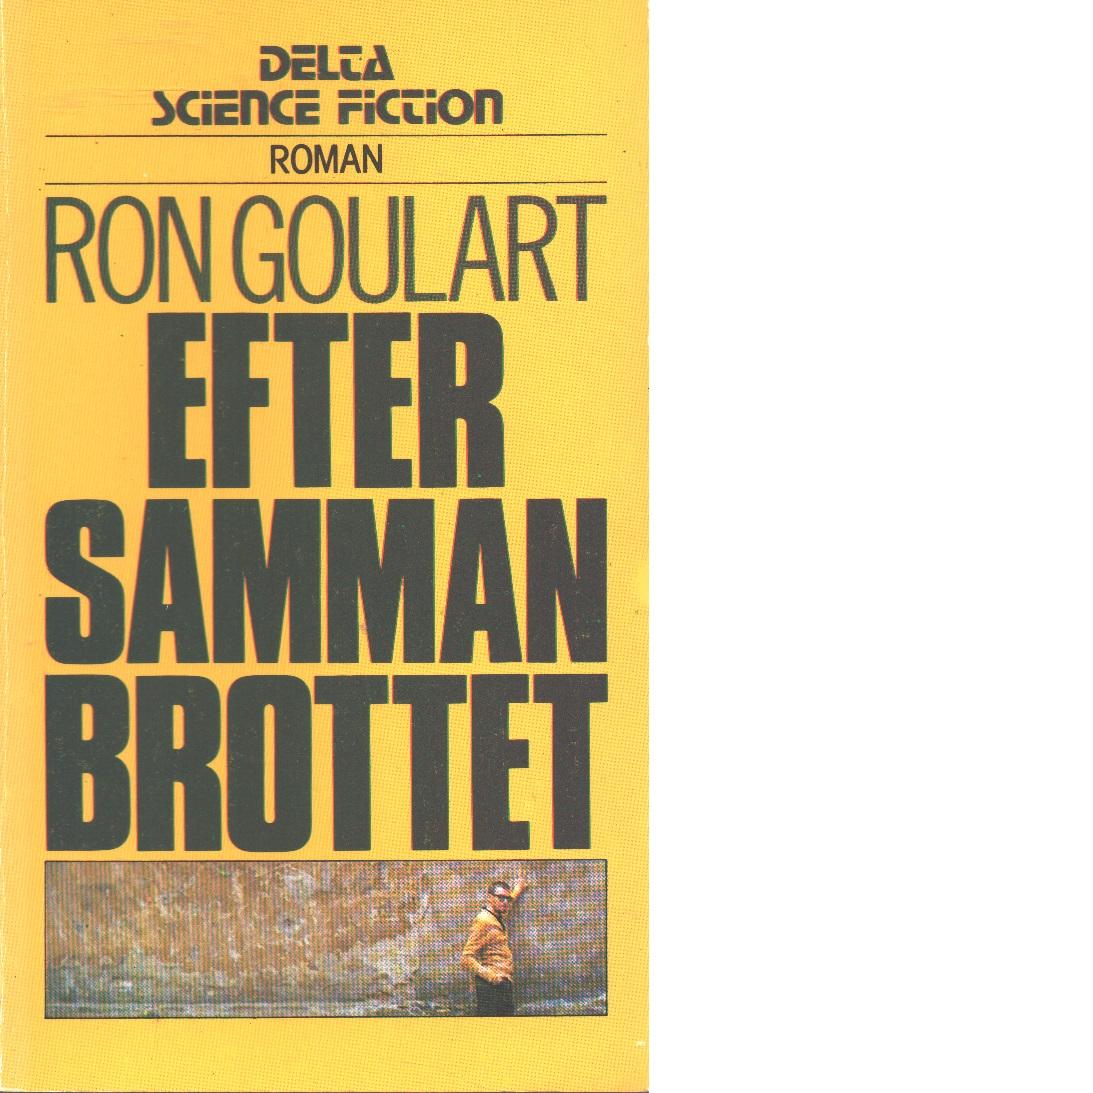 Efter sammanbrottet  - Goulart, Ron